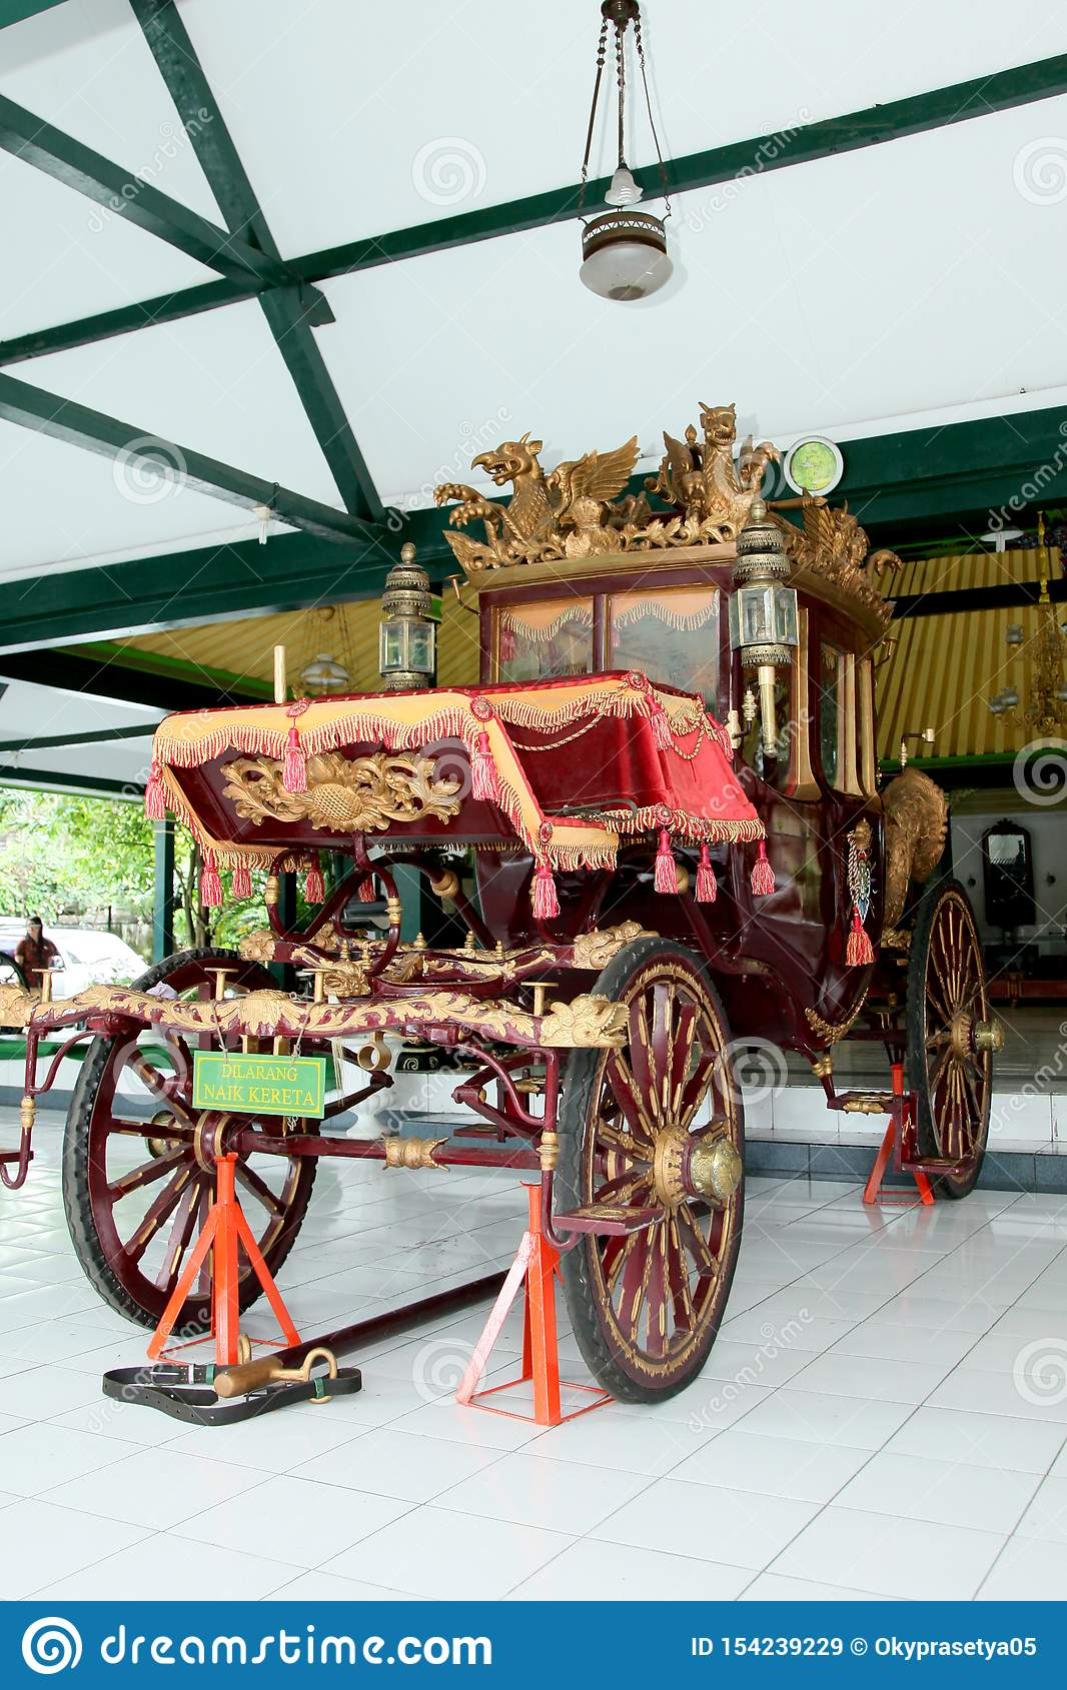 Kereta Kencana Vector : kereta, kencana, vector, Golden, Chariot, Photos, Royalty-Free, Stock, Dreamstime